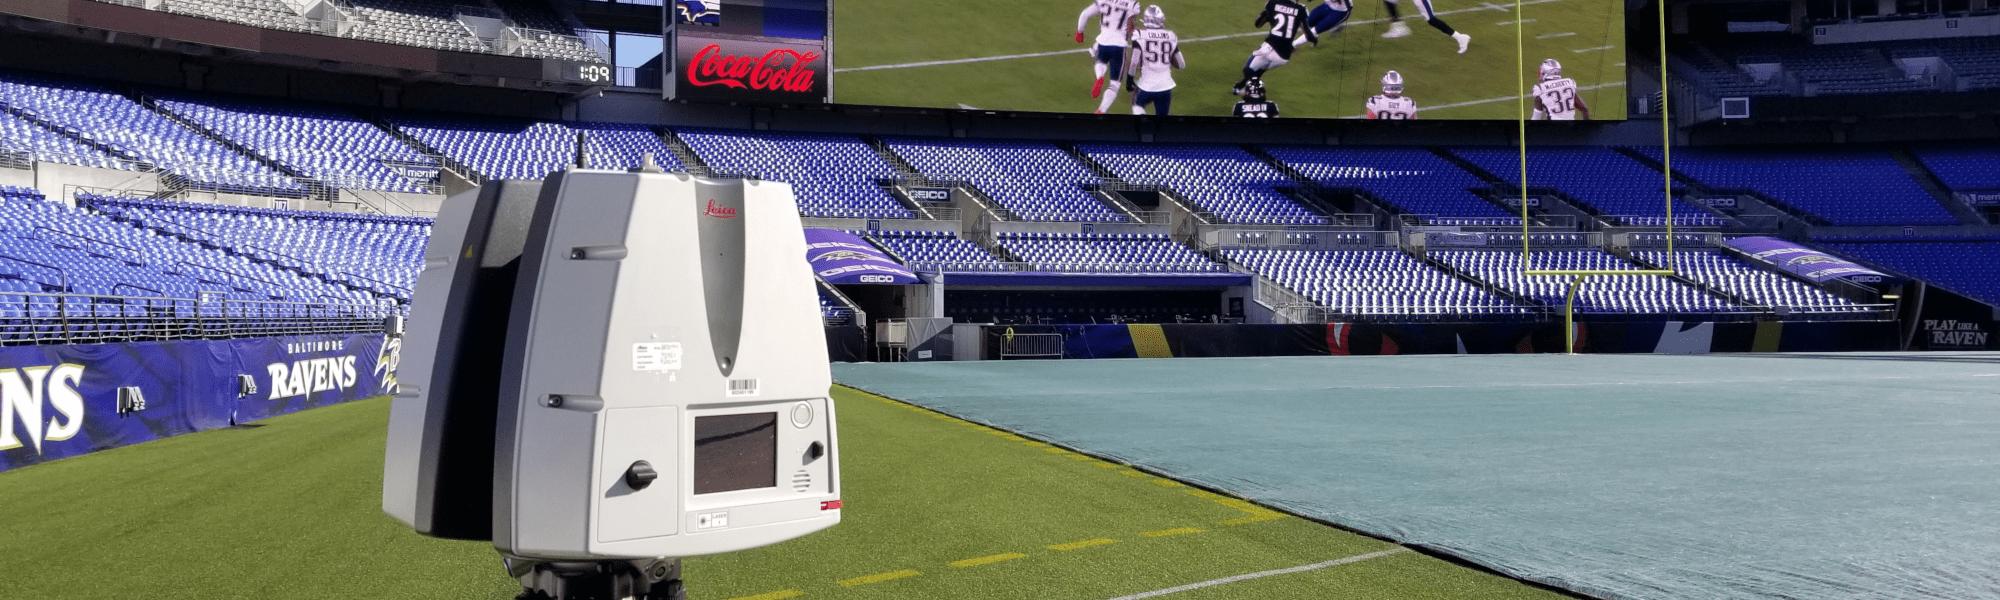 3d laser scanning stadium